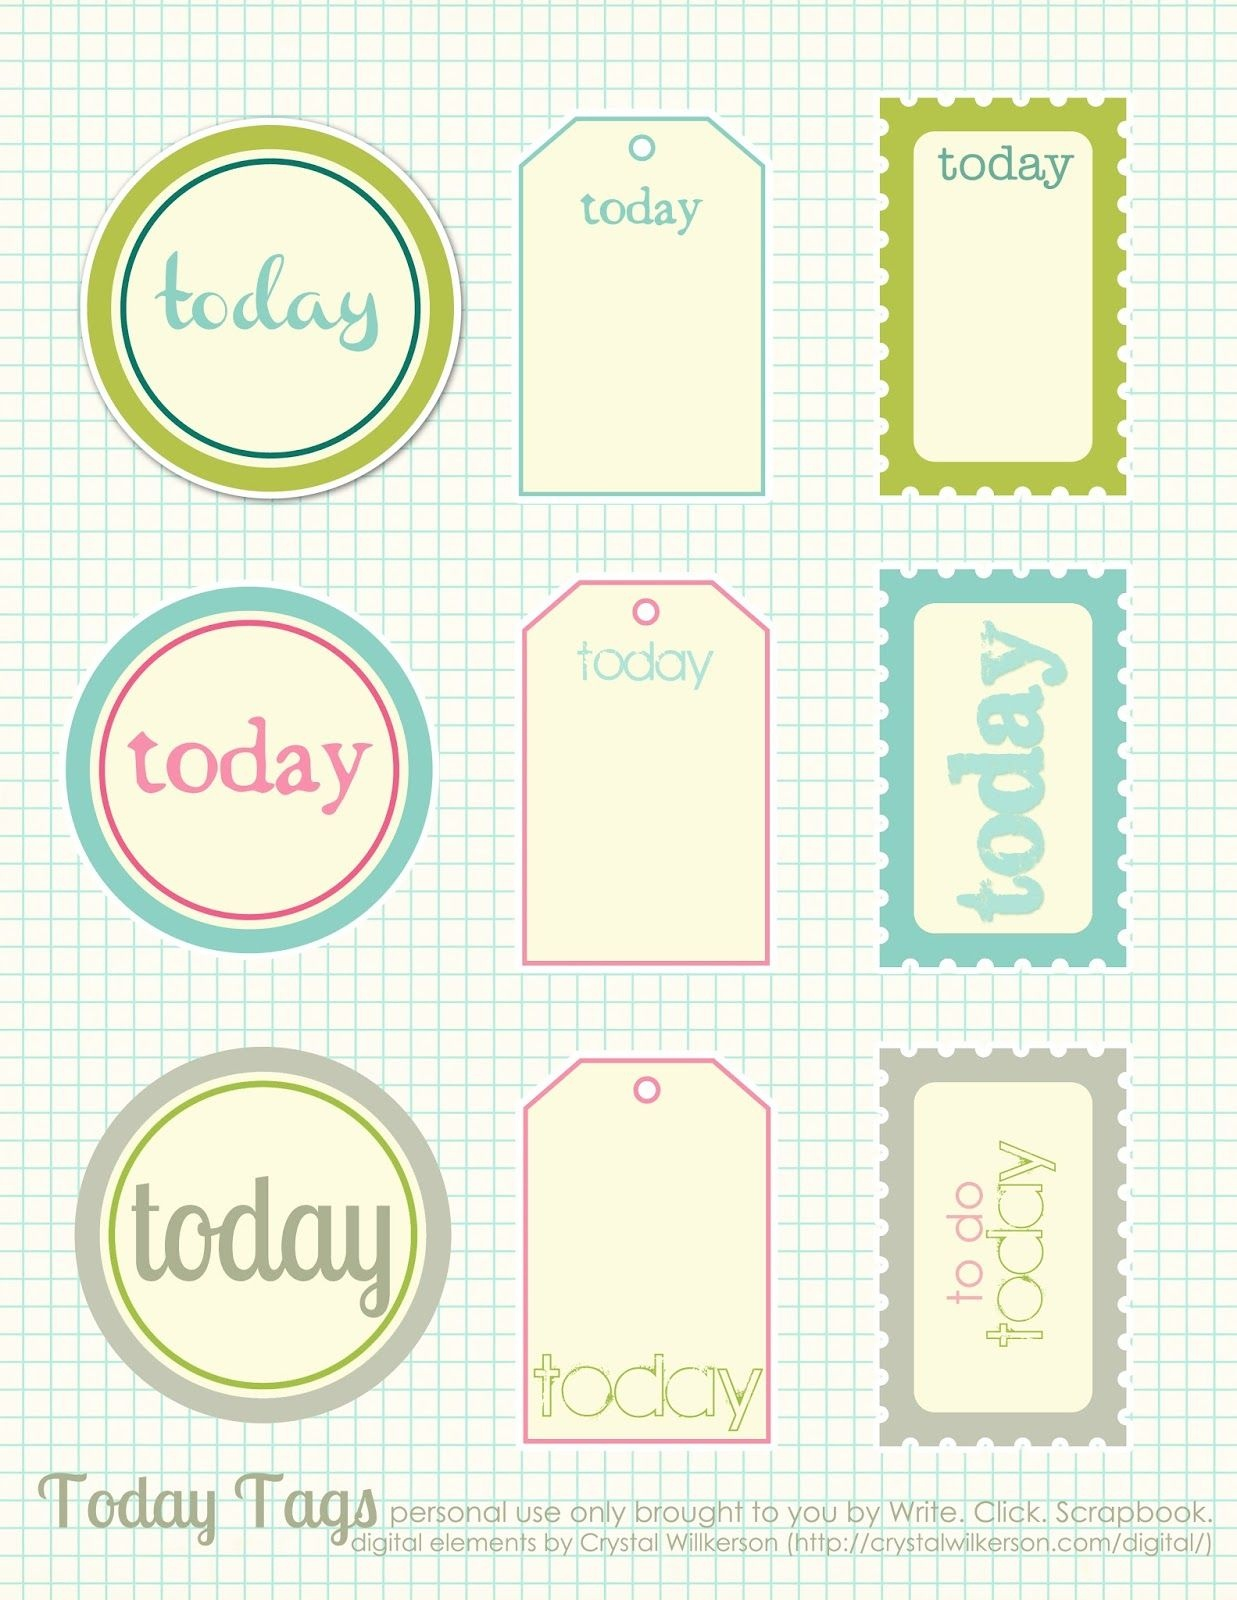 Free Printable Scrapbook Cutouts | Printable For All Topics - Free Printable Scrapbook Templates